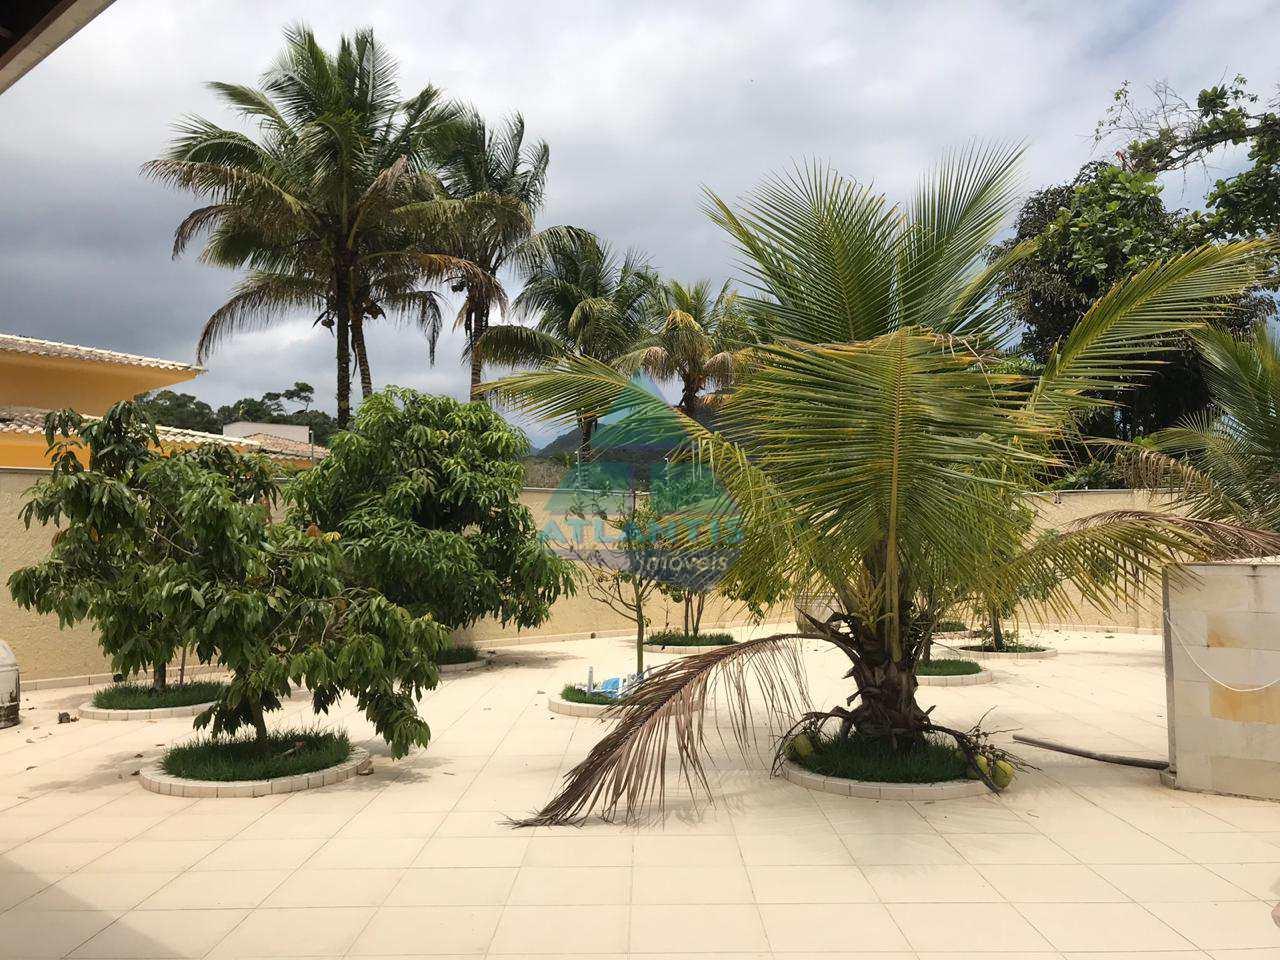 Casa com 3 dorms, Praia Dura, Ubatuba - R$ 1.47 mi, Cod: 1050